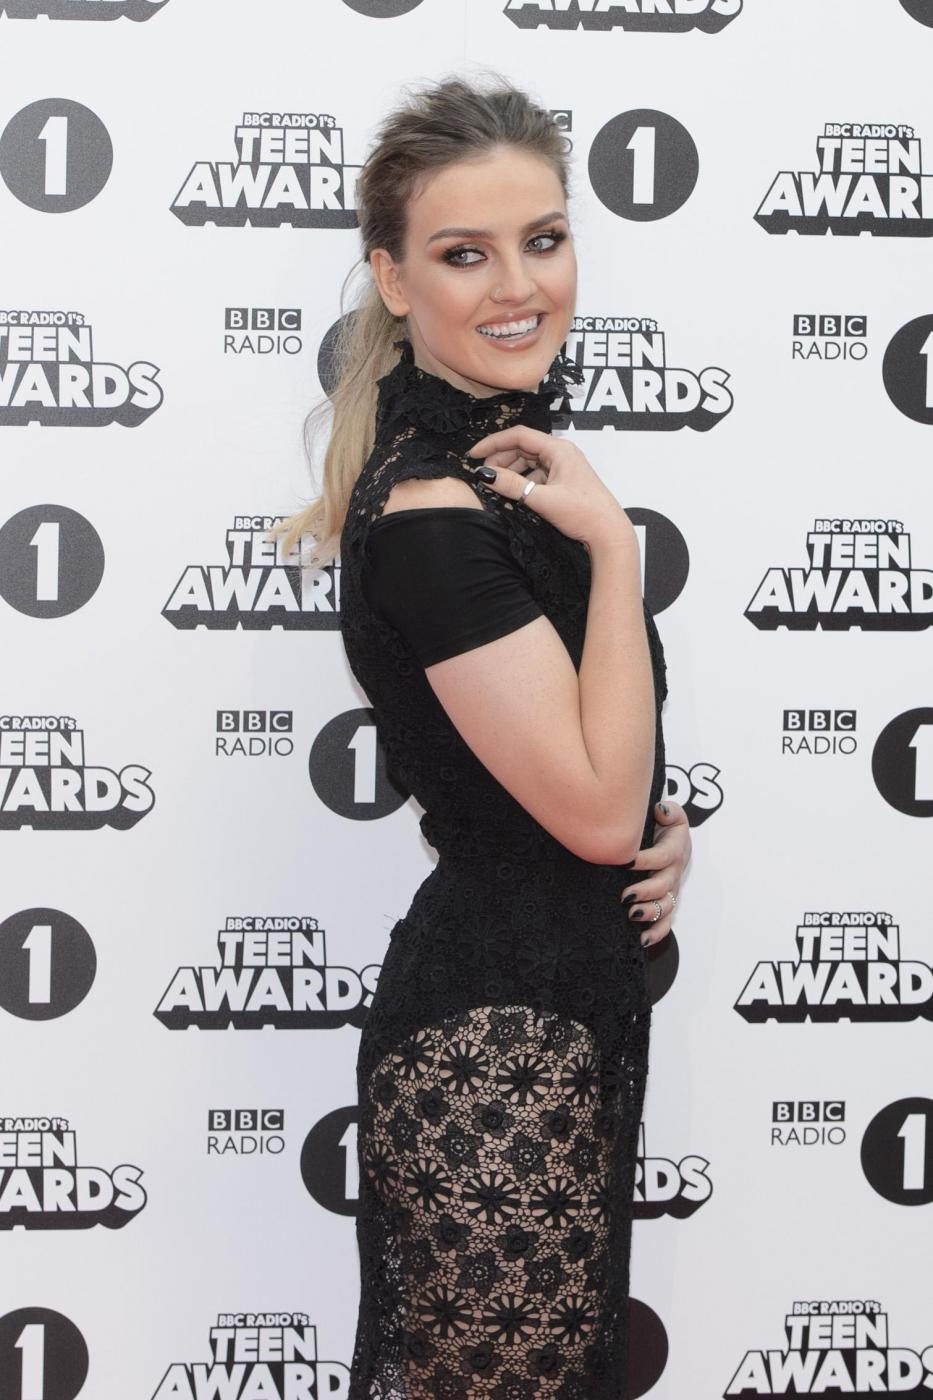 Perrie Edwards, ex Zayn Malik sensuale ai Teen Awards 2015 FOTO 4